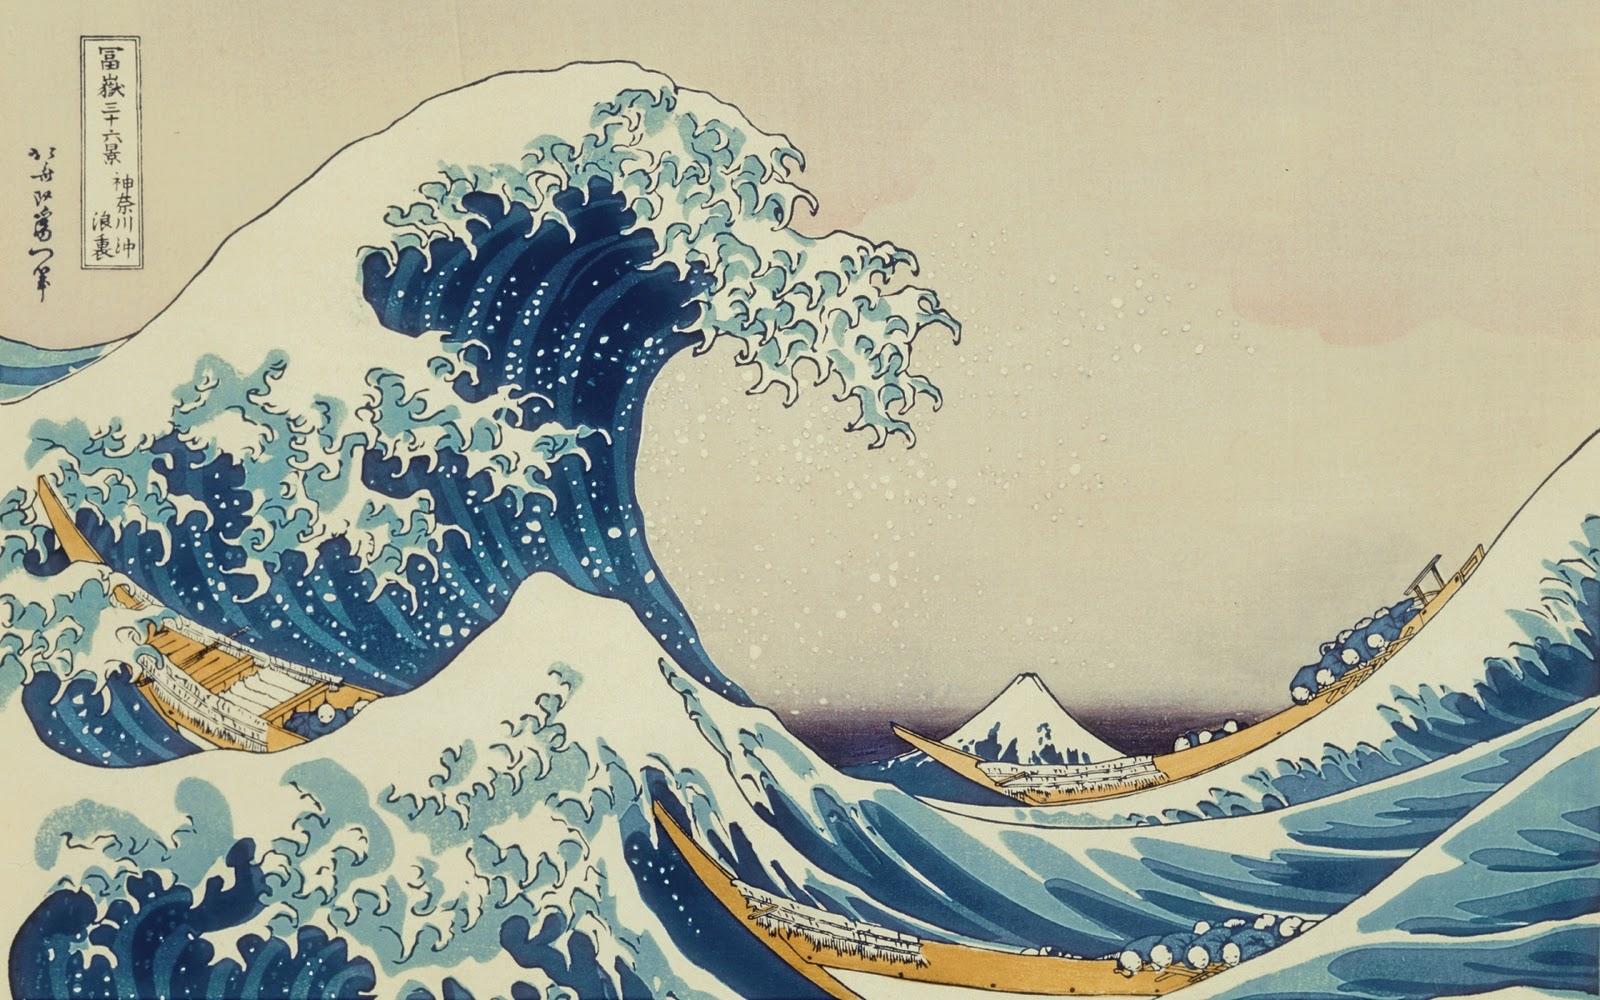 Wallpaper Hokusai Download Wallpaper DaWallpaperz 1600x1000